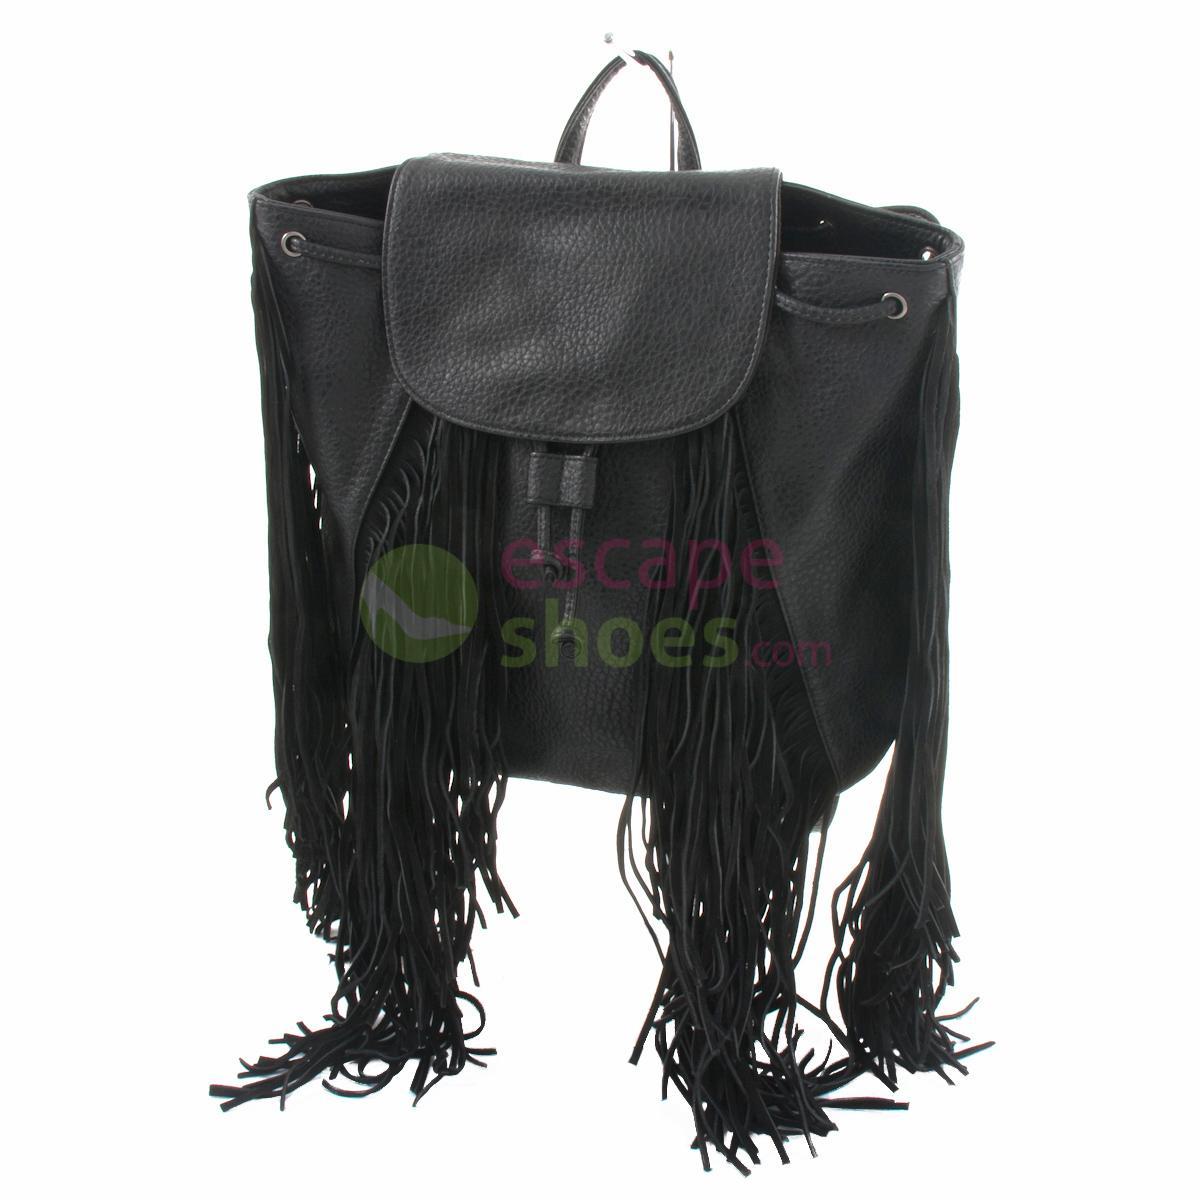 Tienda Pl030603 999 Black Tus Pepe Aquí Bolso Jeans Compra Bayi pz0qW